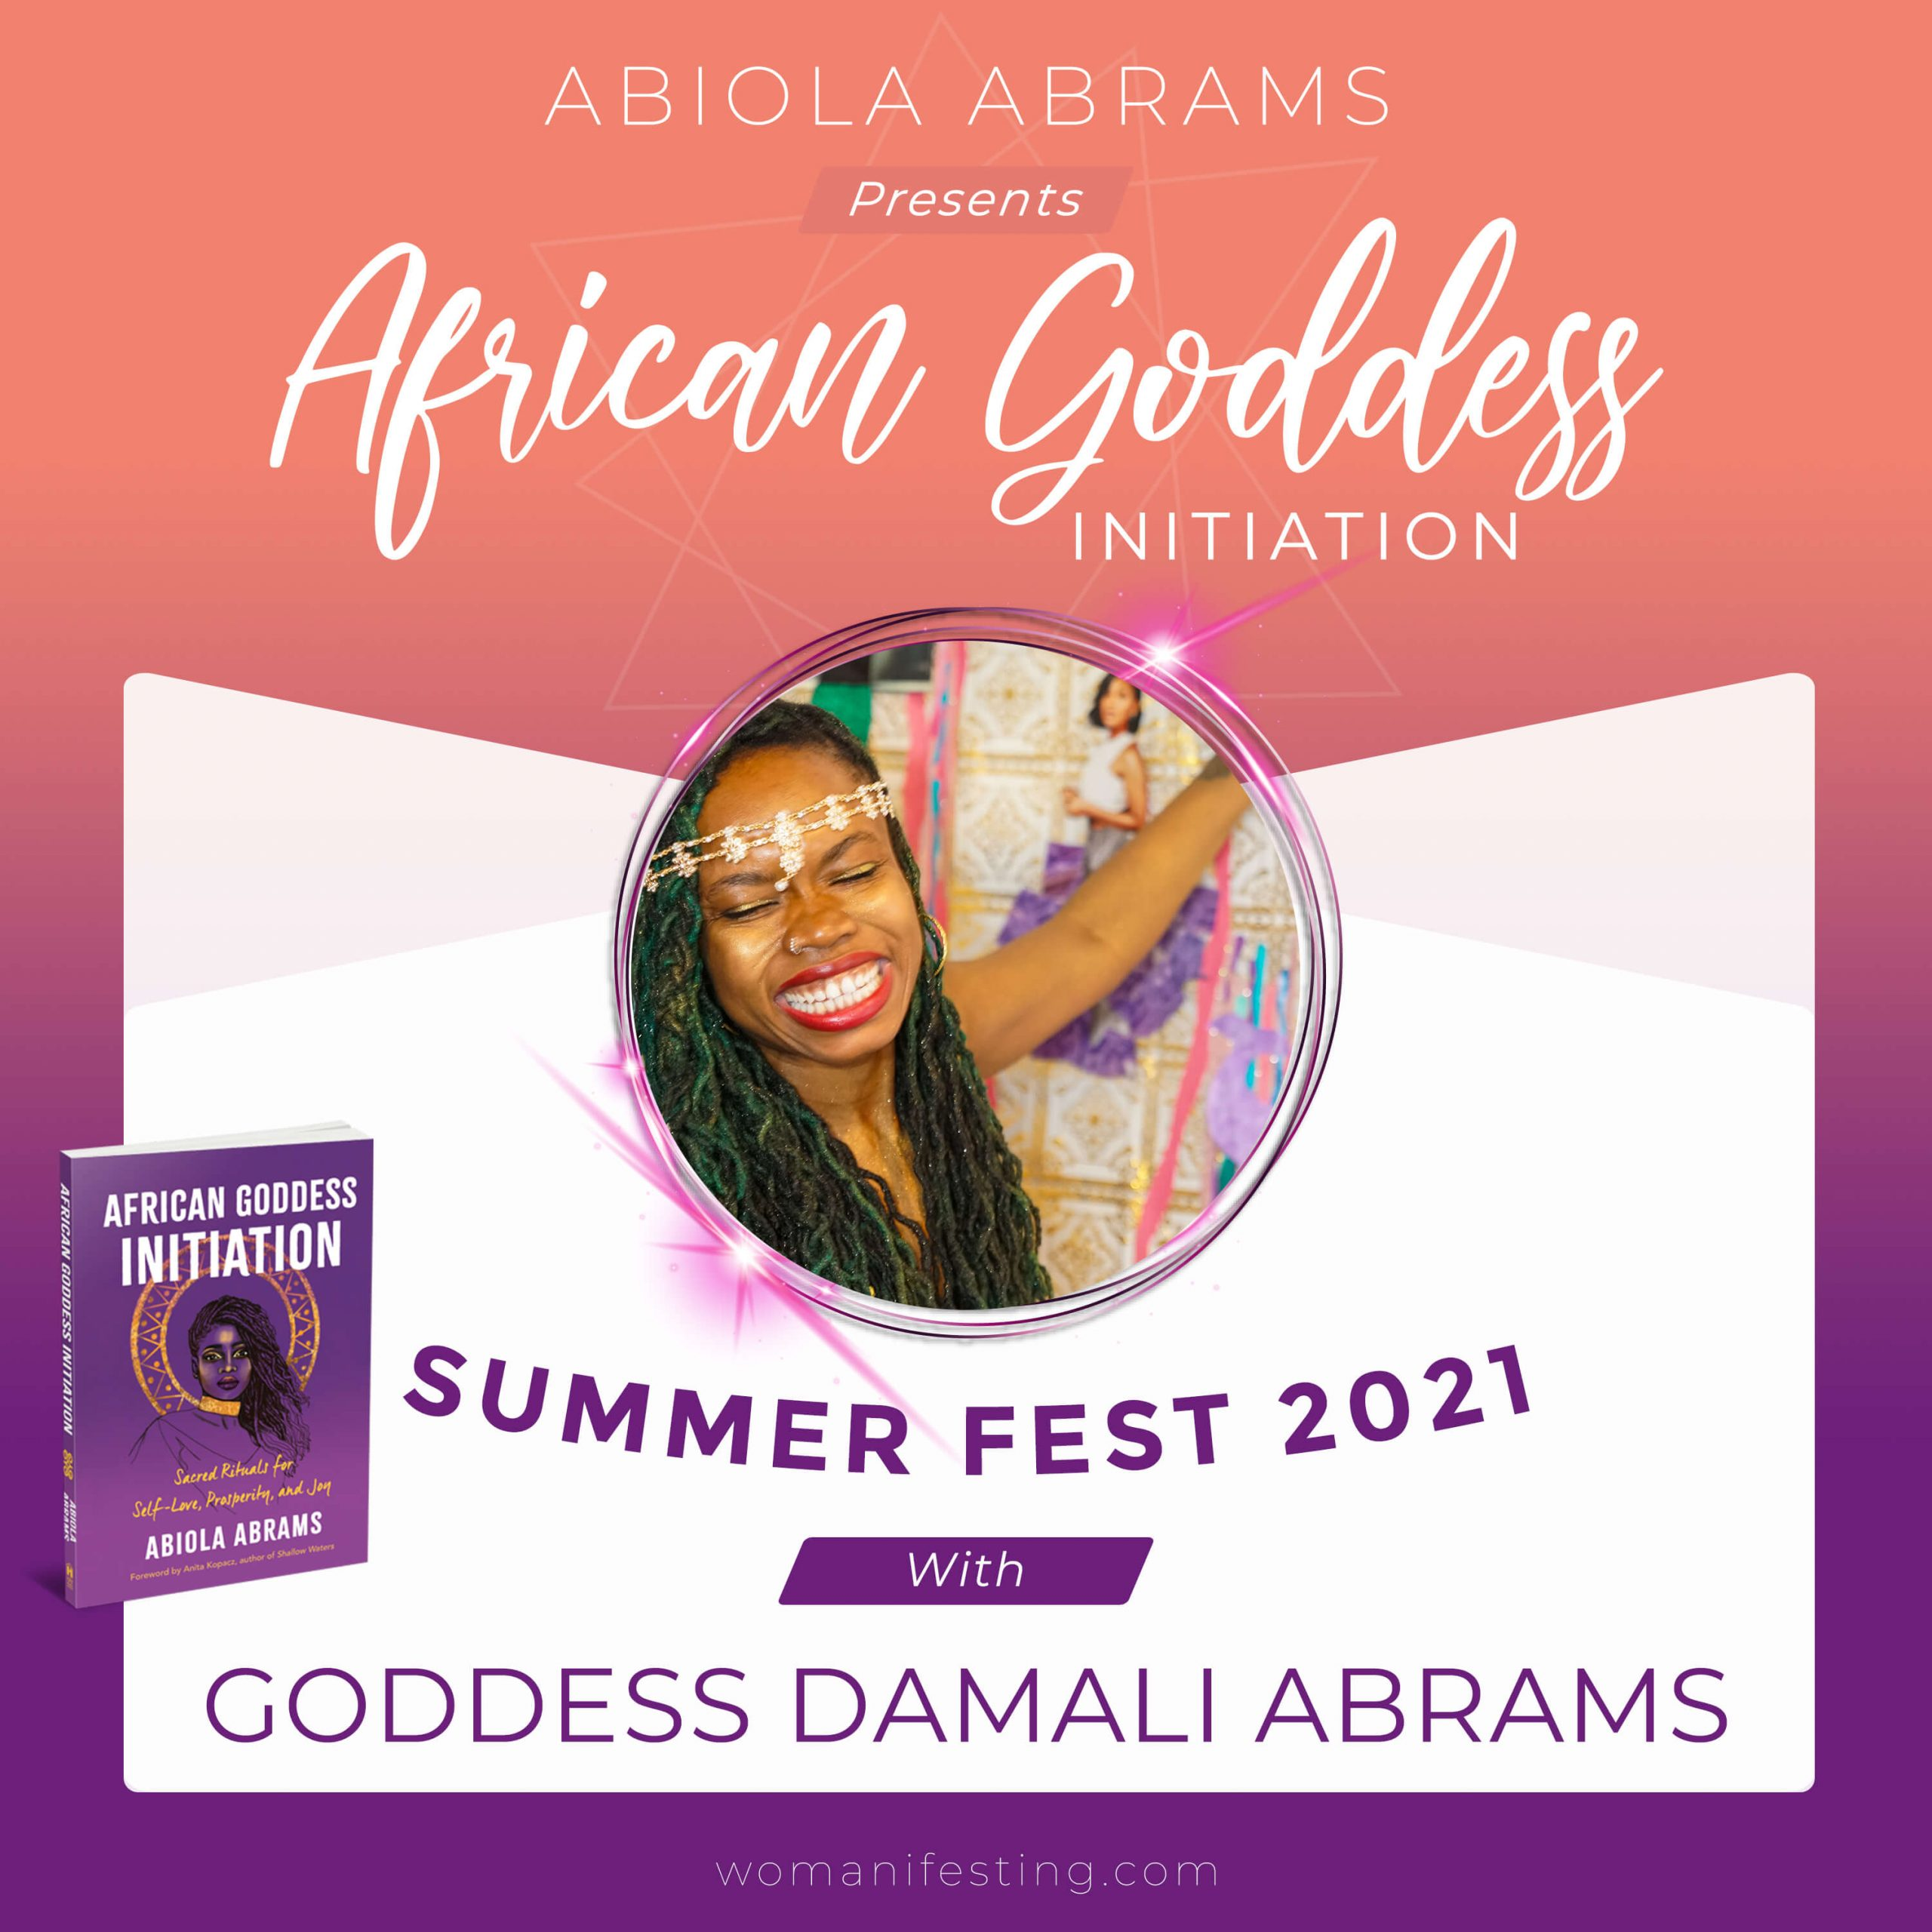 Goddess Damali Abrams: African Goddess Initiation Fest Guru